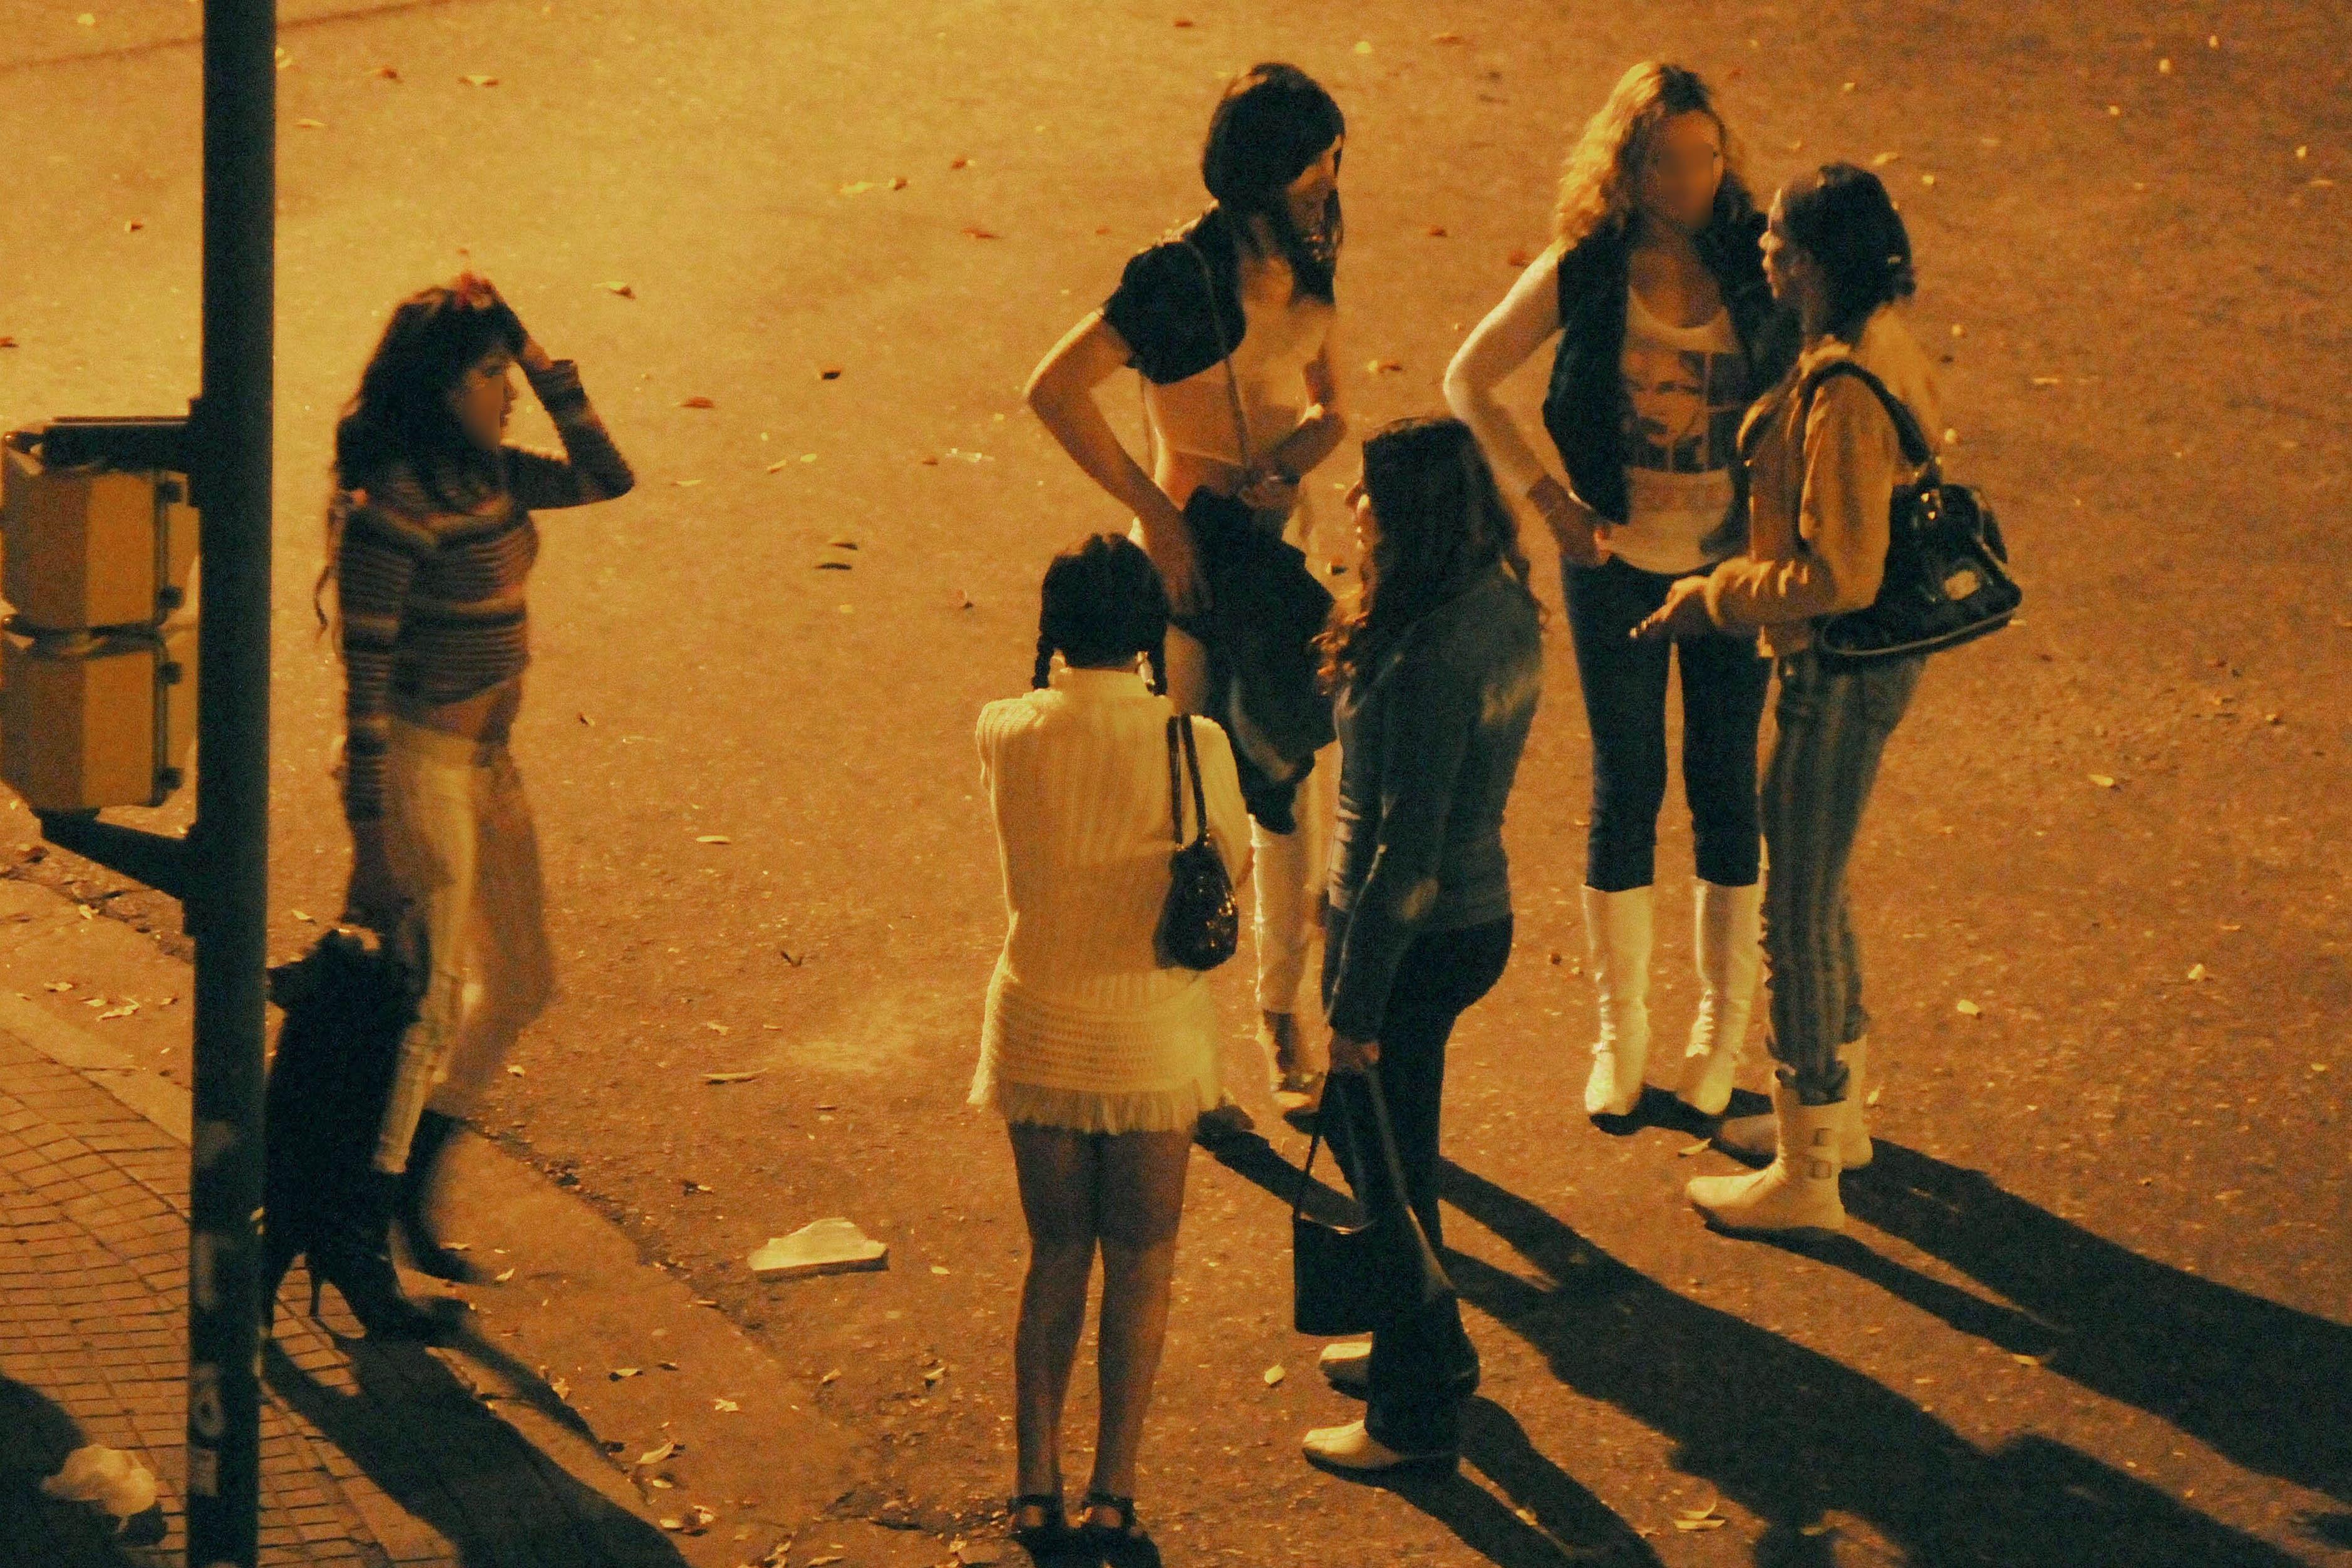 prostitutas negras en barcelona sexo videos prostitutas